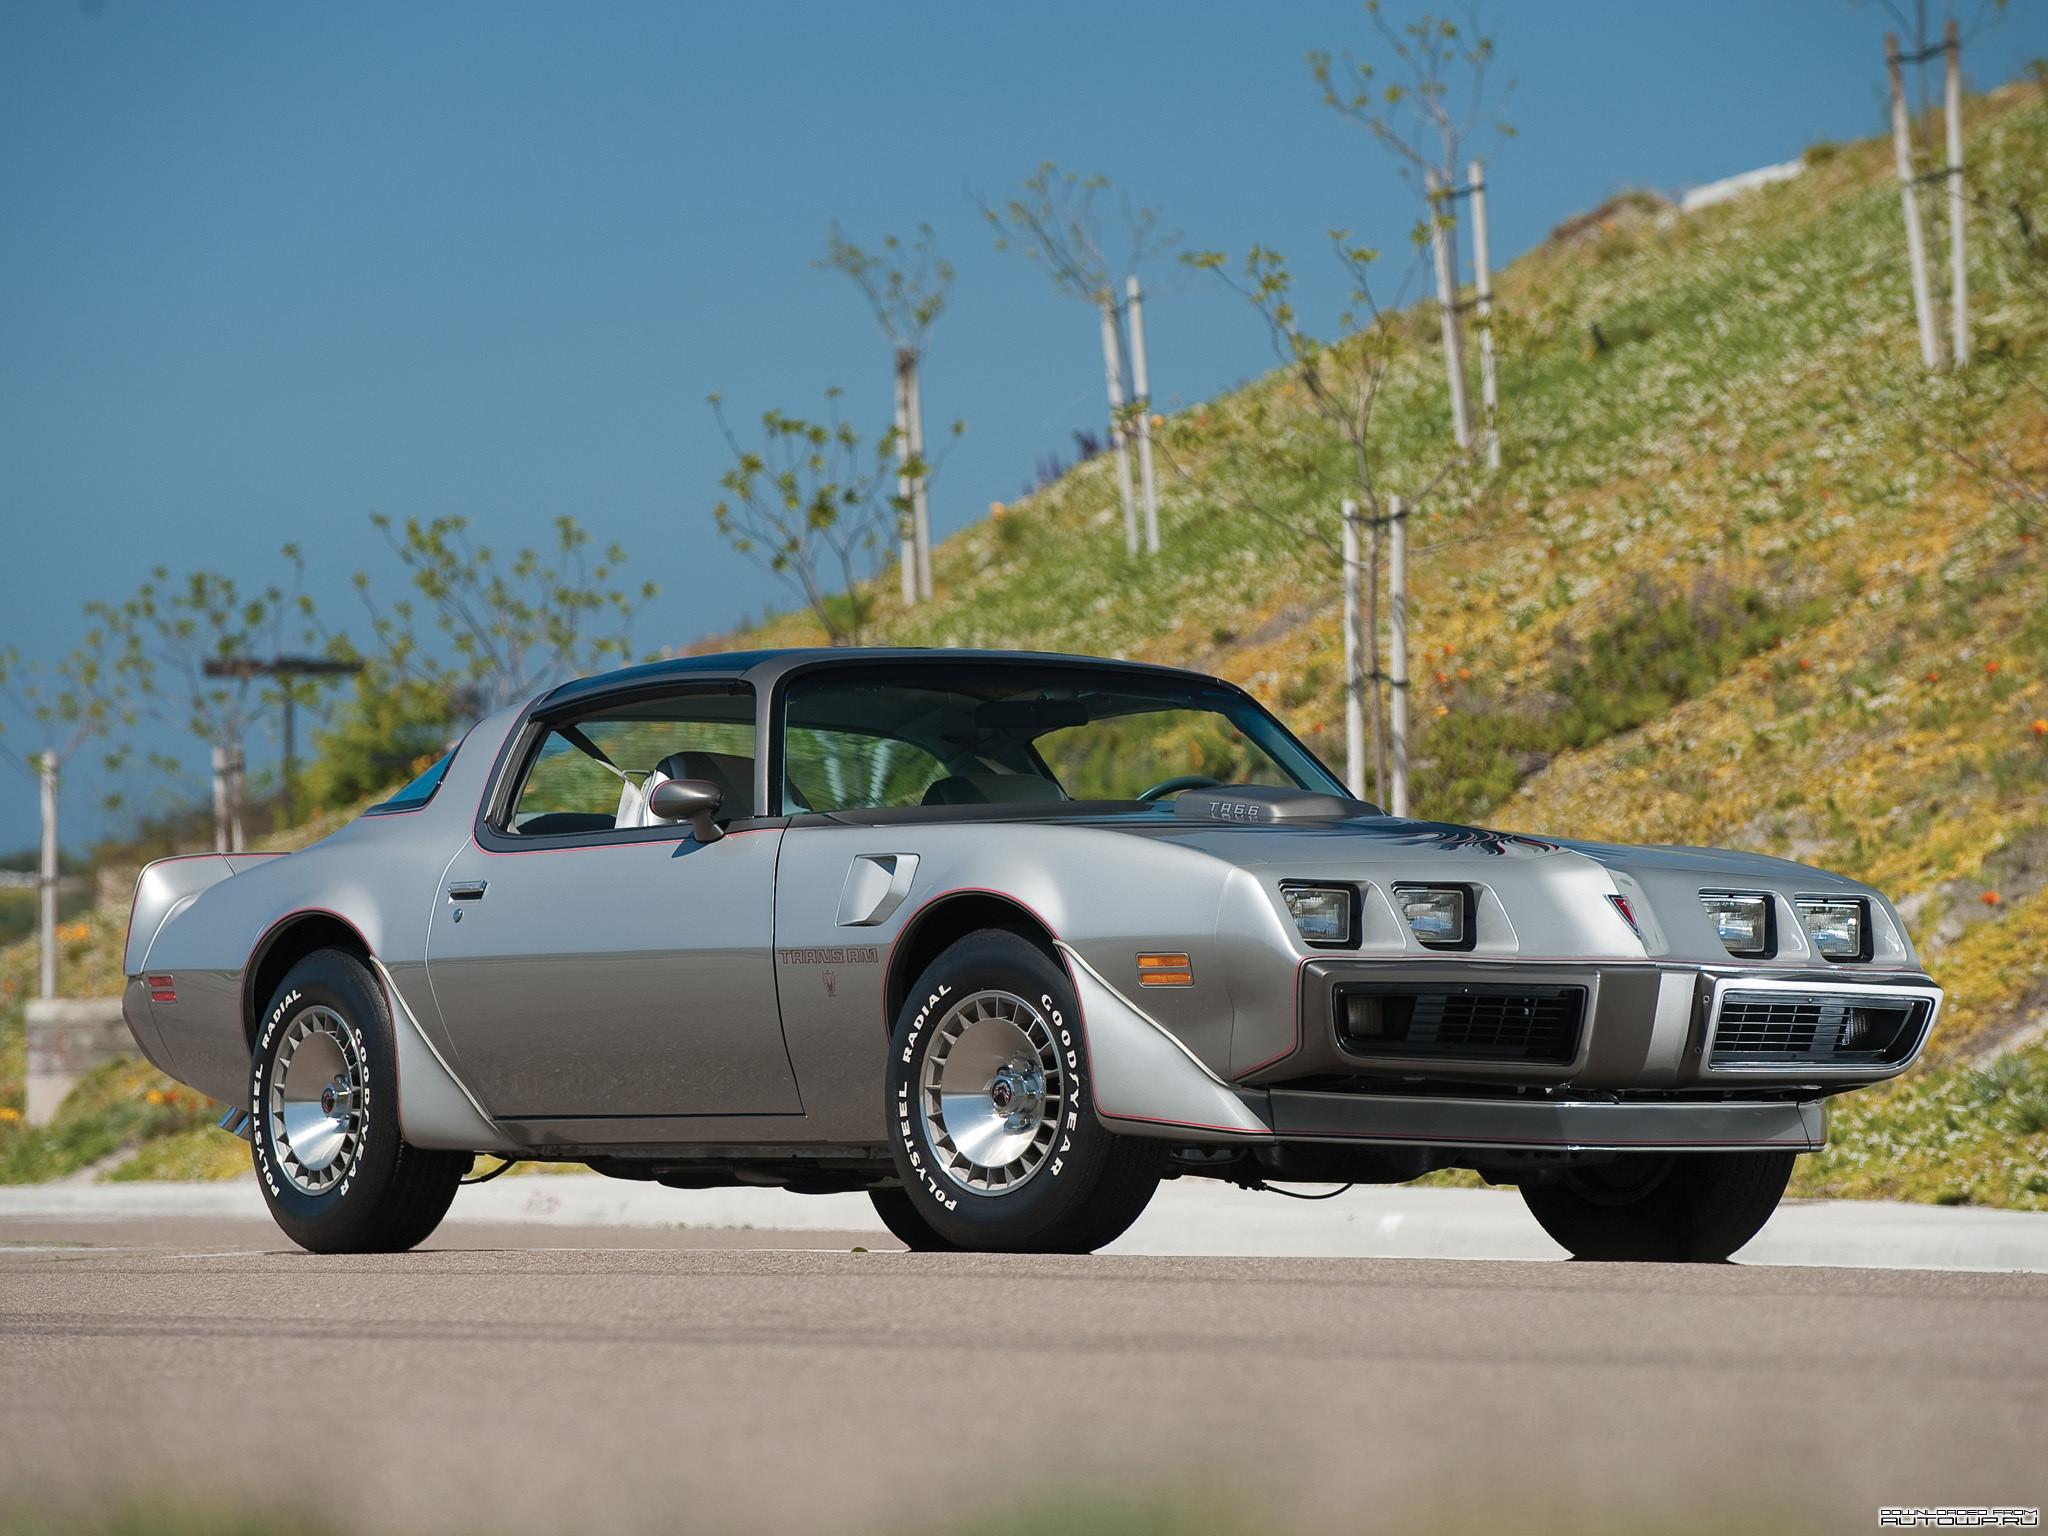 Pontiac Firebird Trans Am 10th Anniversary 1979